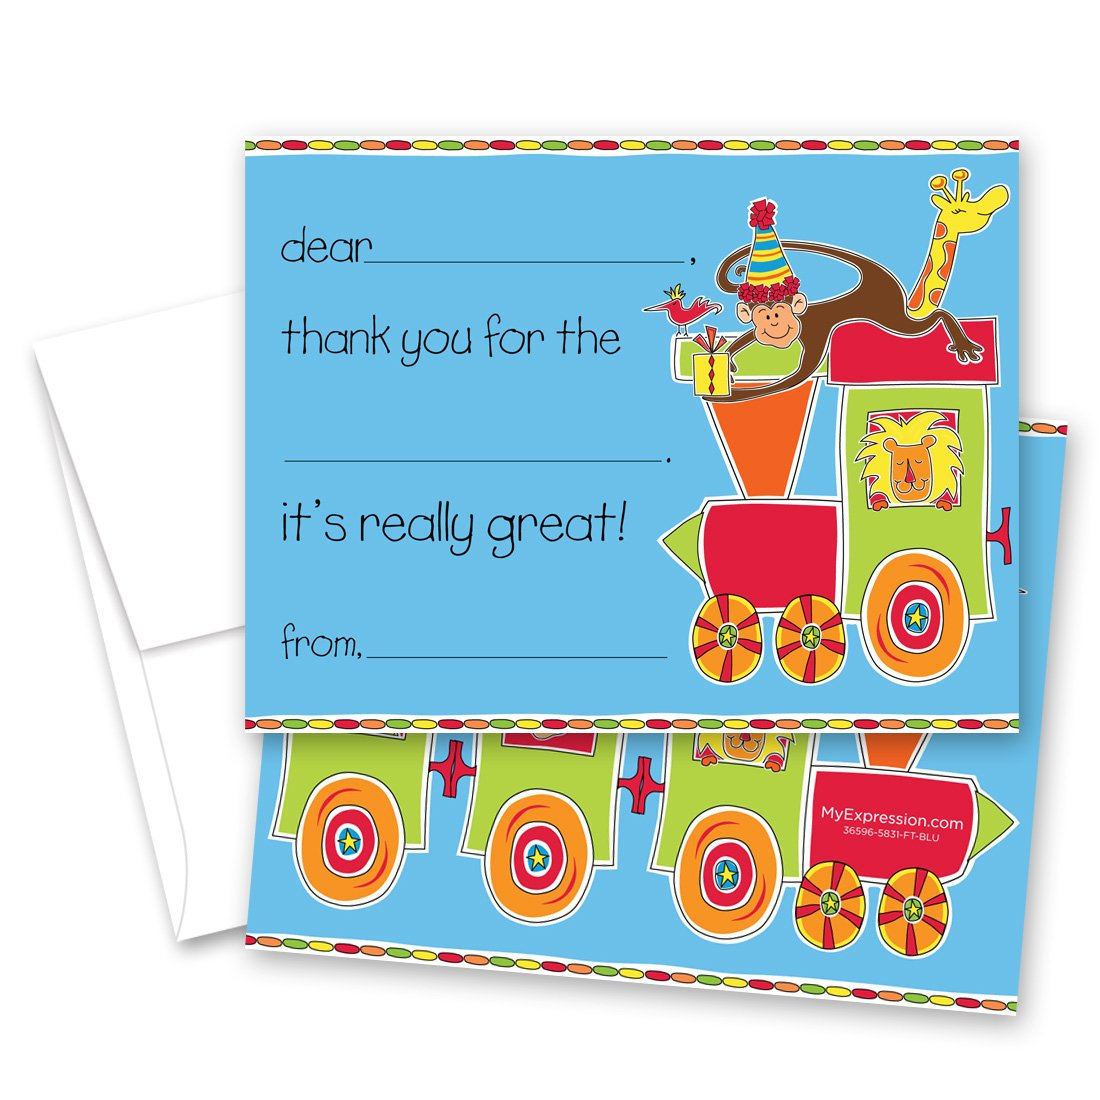 MyExpression.com 20 Choo Choo Train Safari Animals Children Fill-in Birthday Thank You Cards